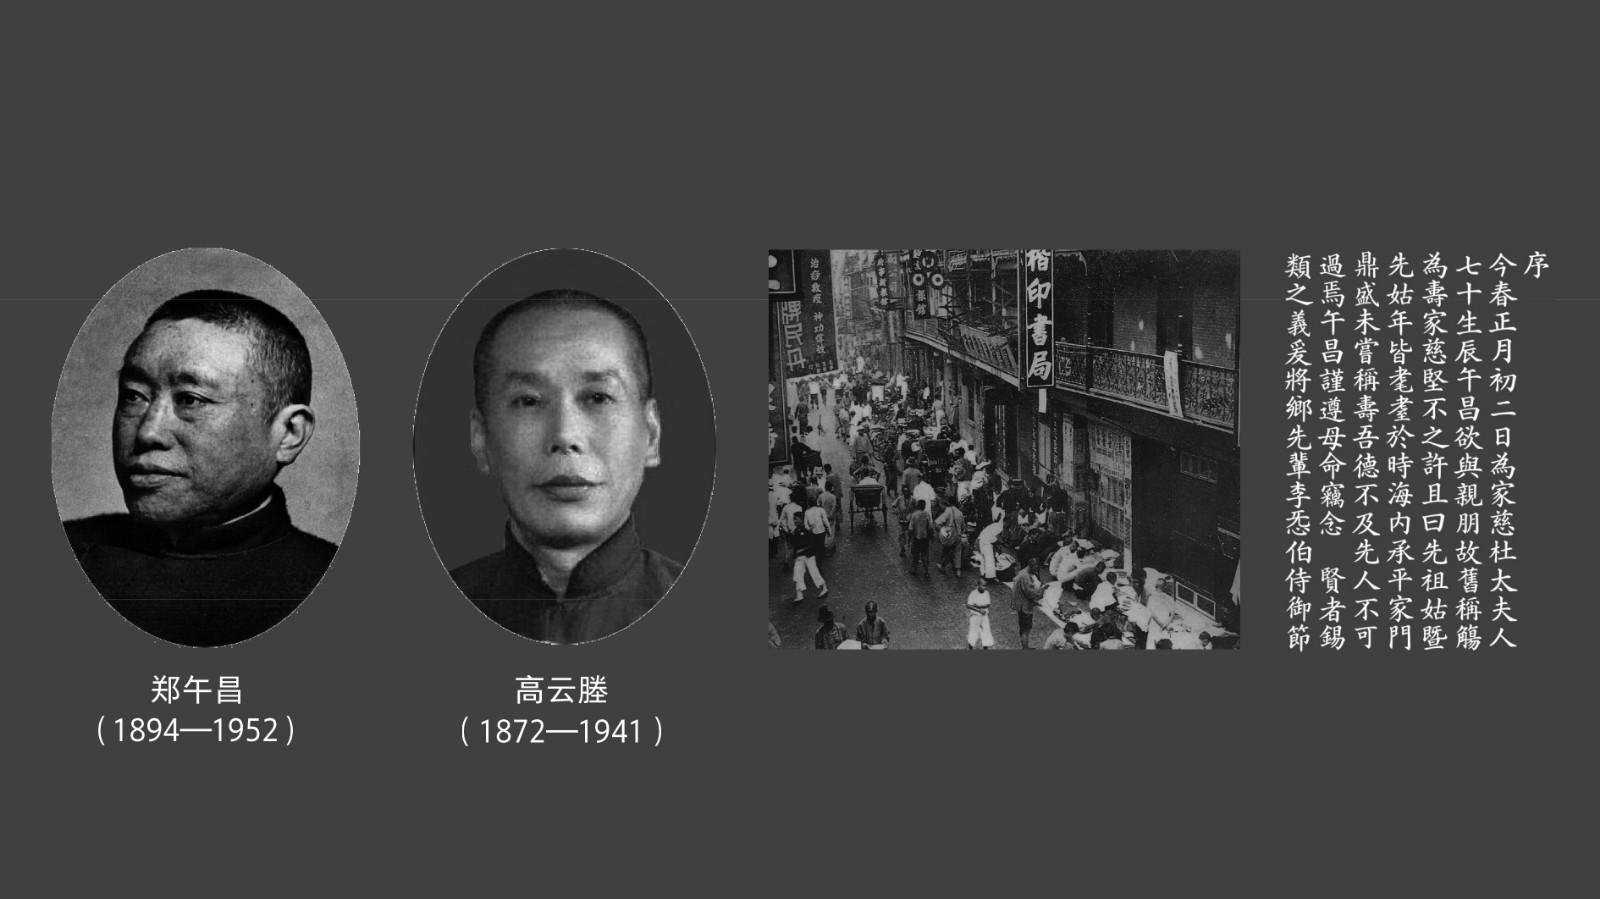 https://ft-bk1.oss-cn-zhangjiakou.aliyuncs.com/Public/Uploads/img/n_content_20201210104442_1361.jpg